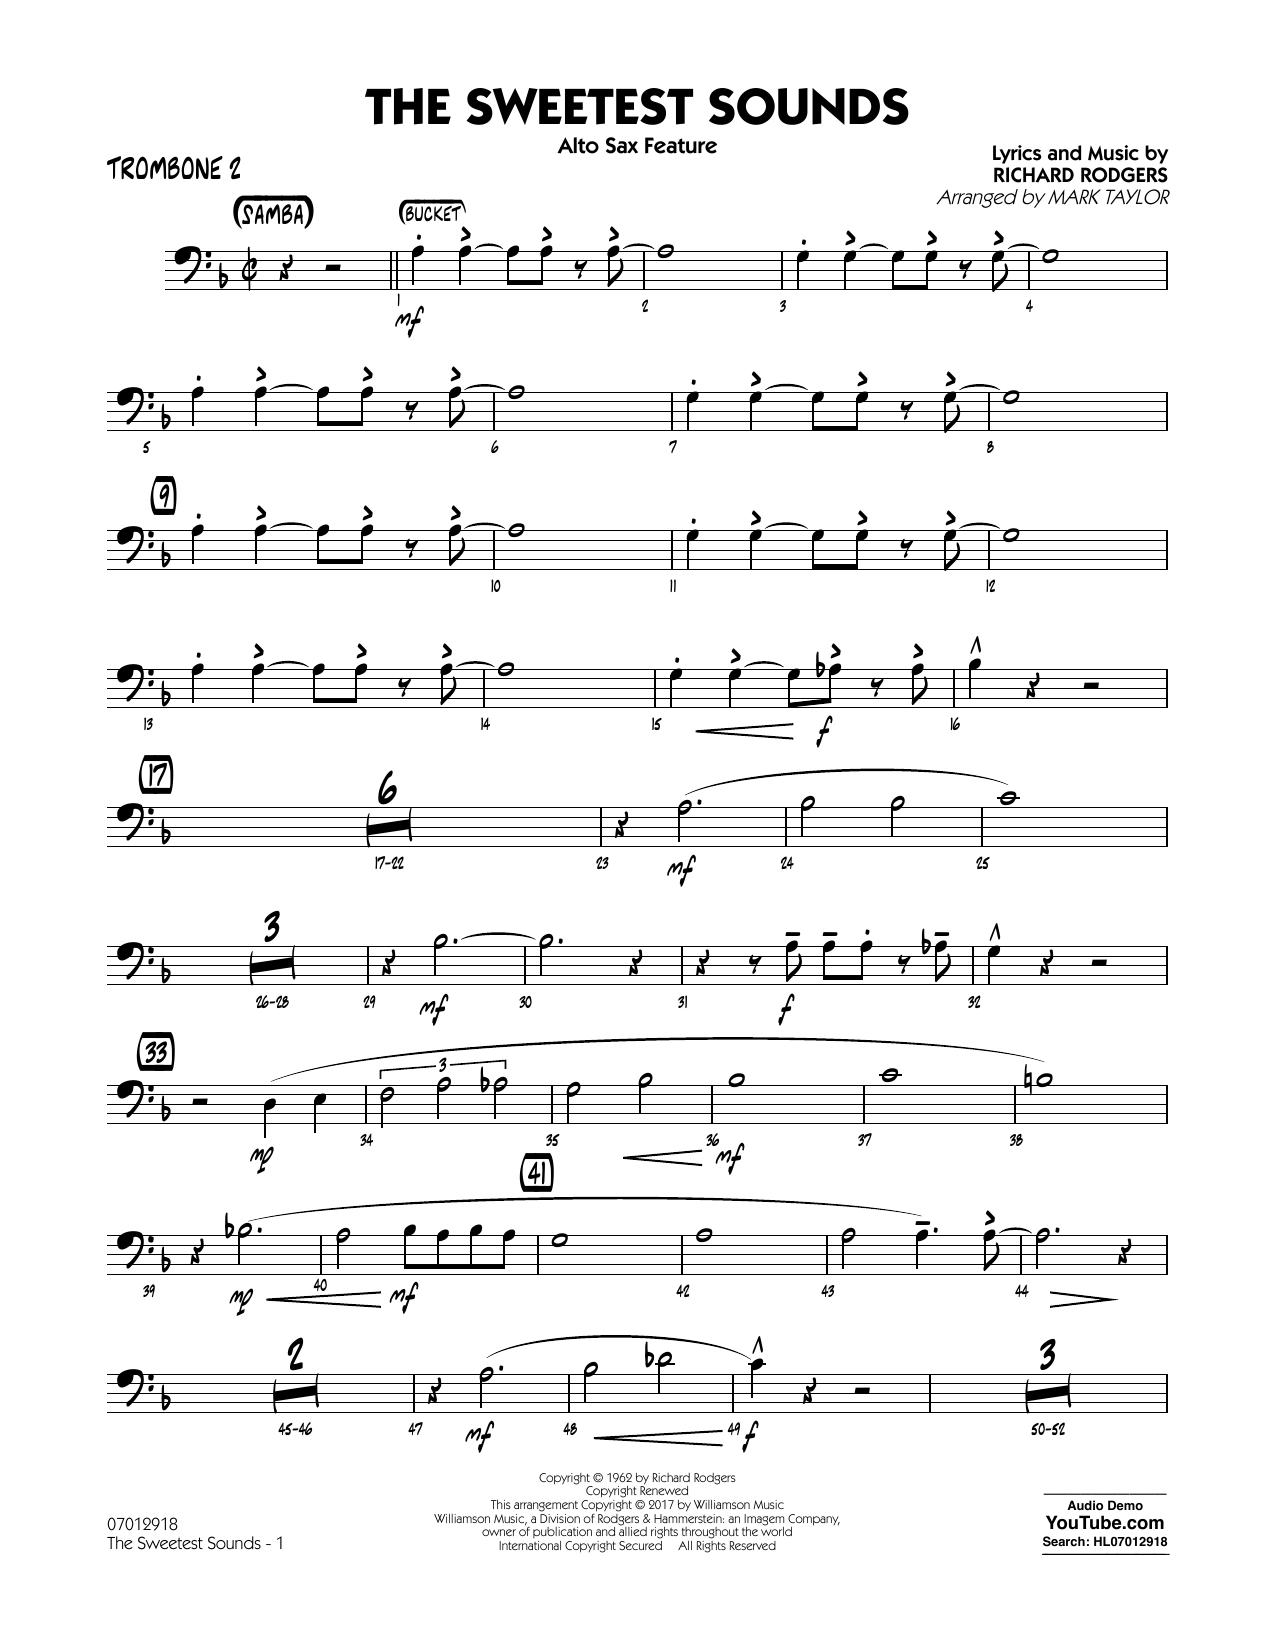 The Sweetest Sounds (Alto Sax Feature) - Trombone 2 Sheet Music